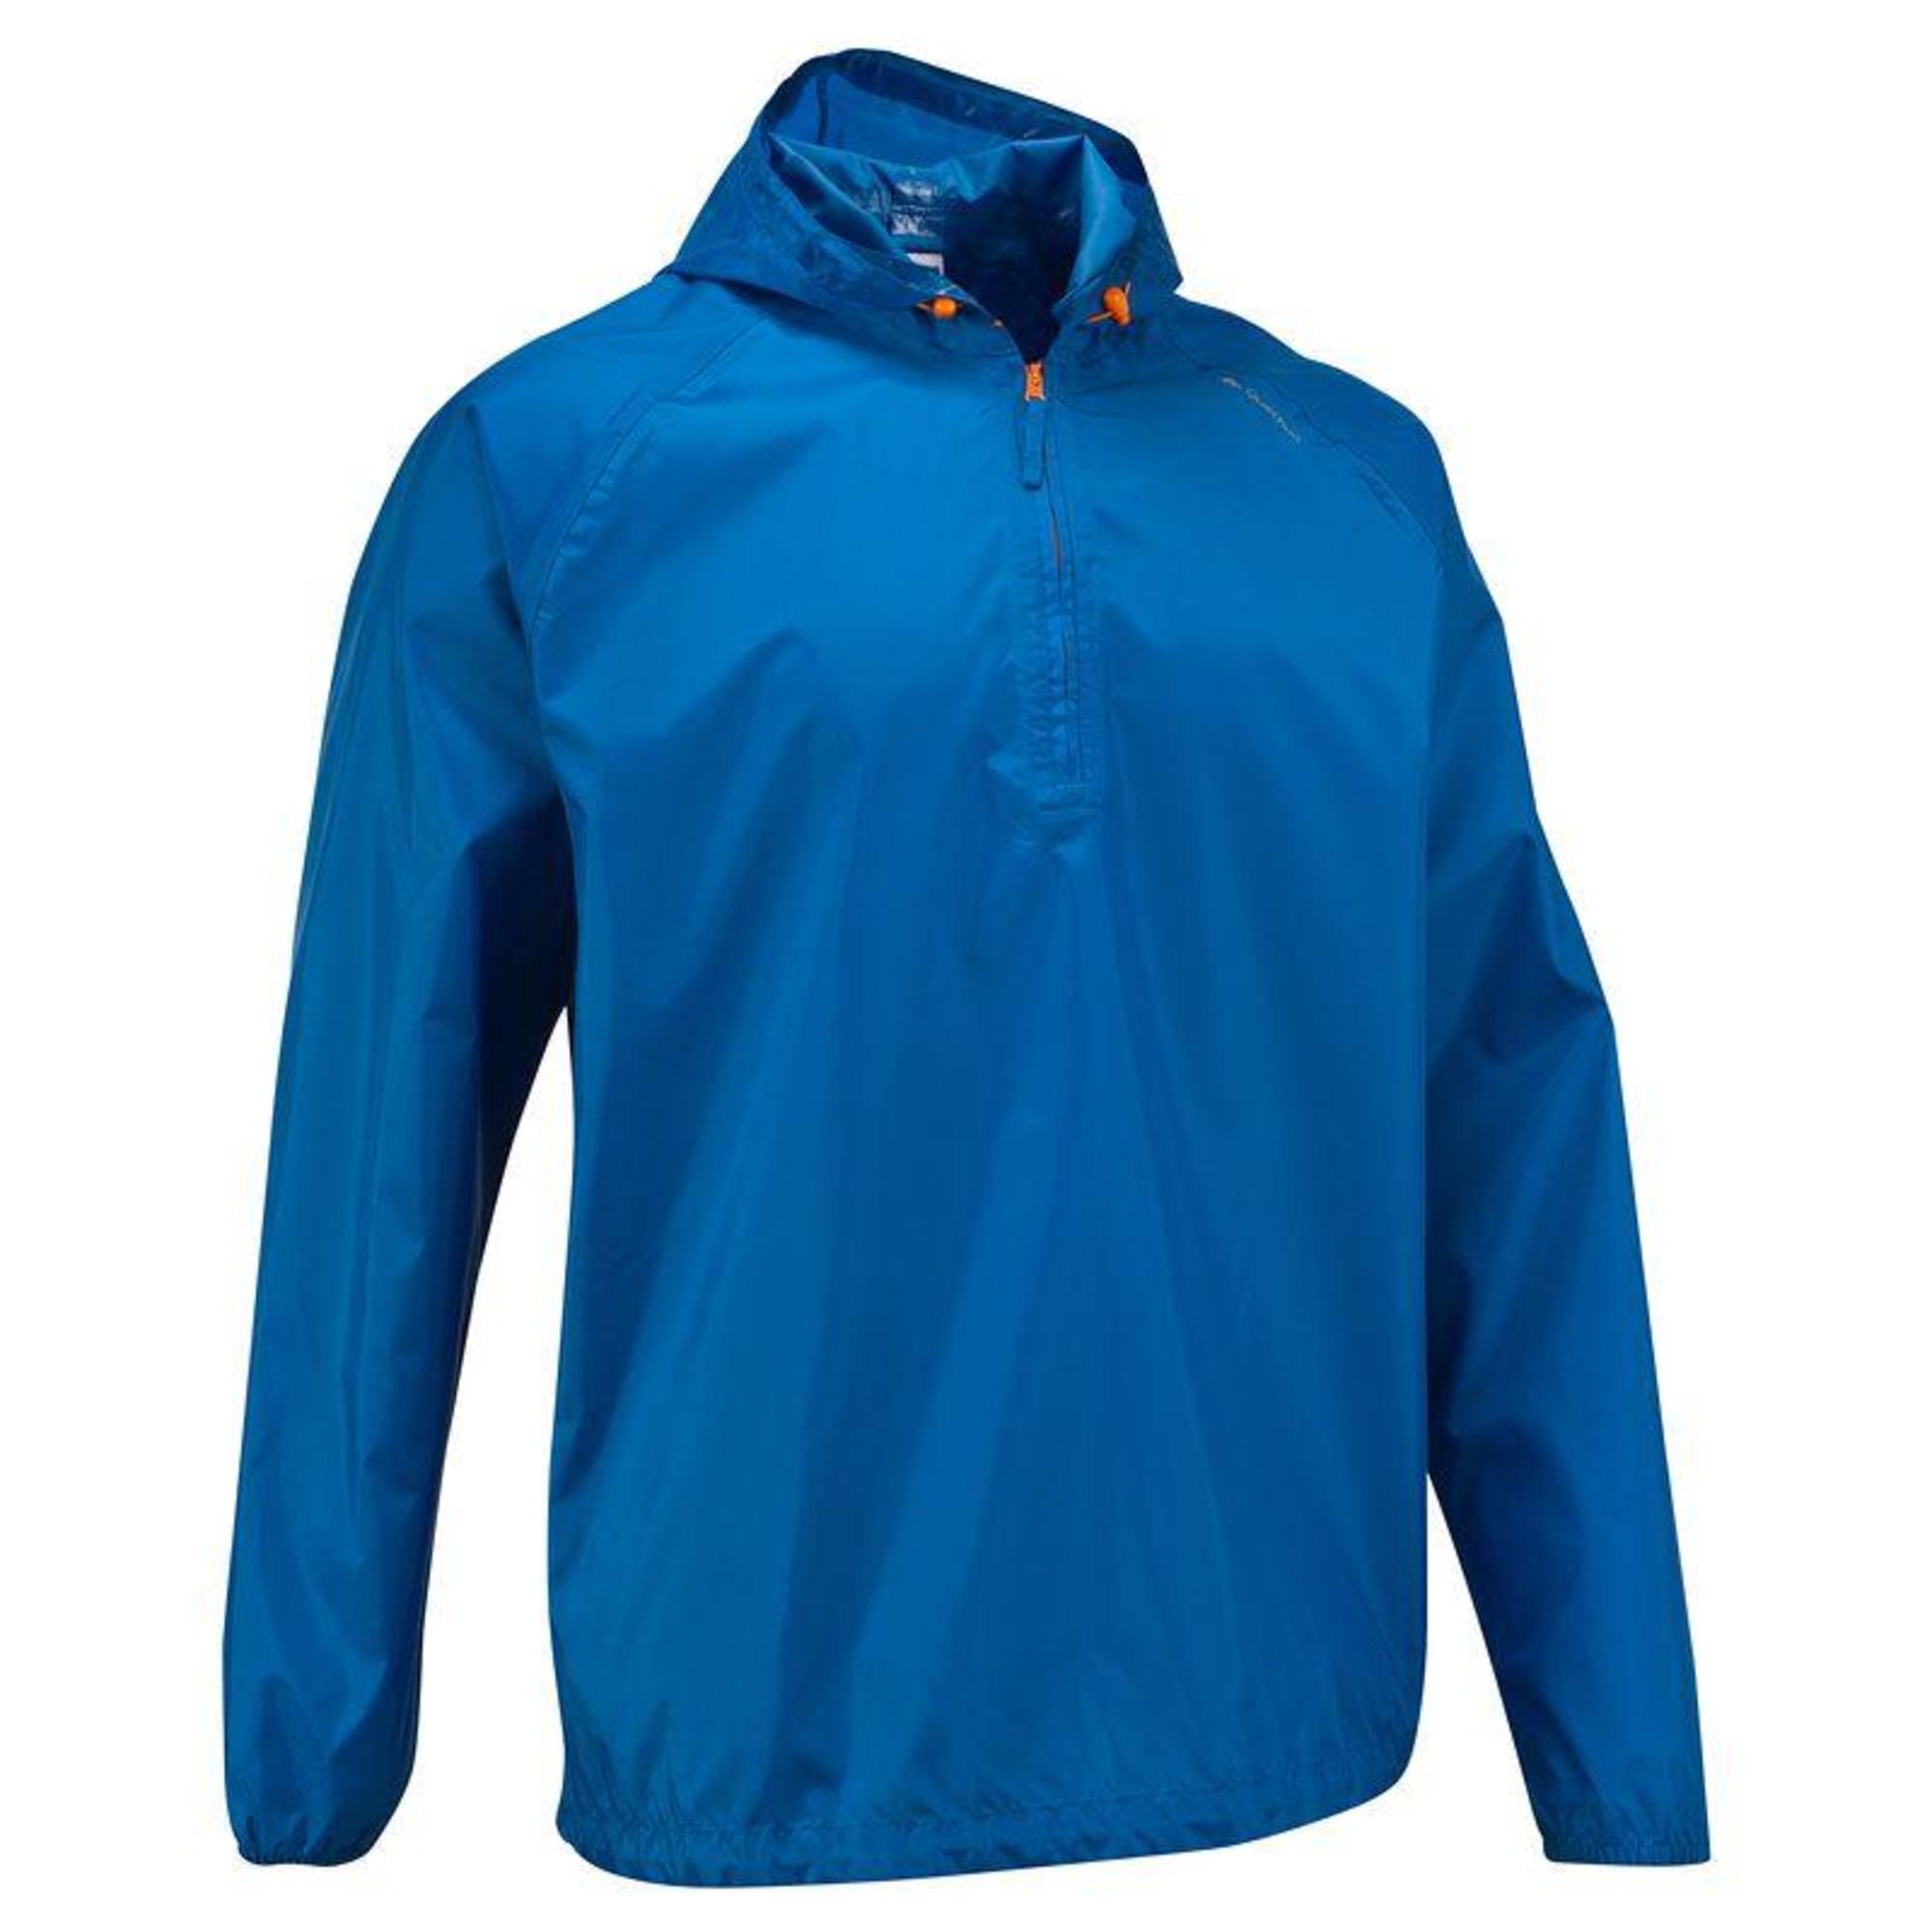 Veste adidas femme bleu turquoise